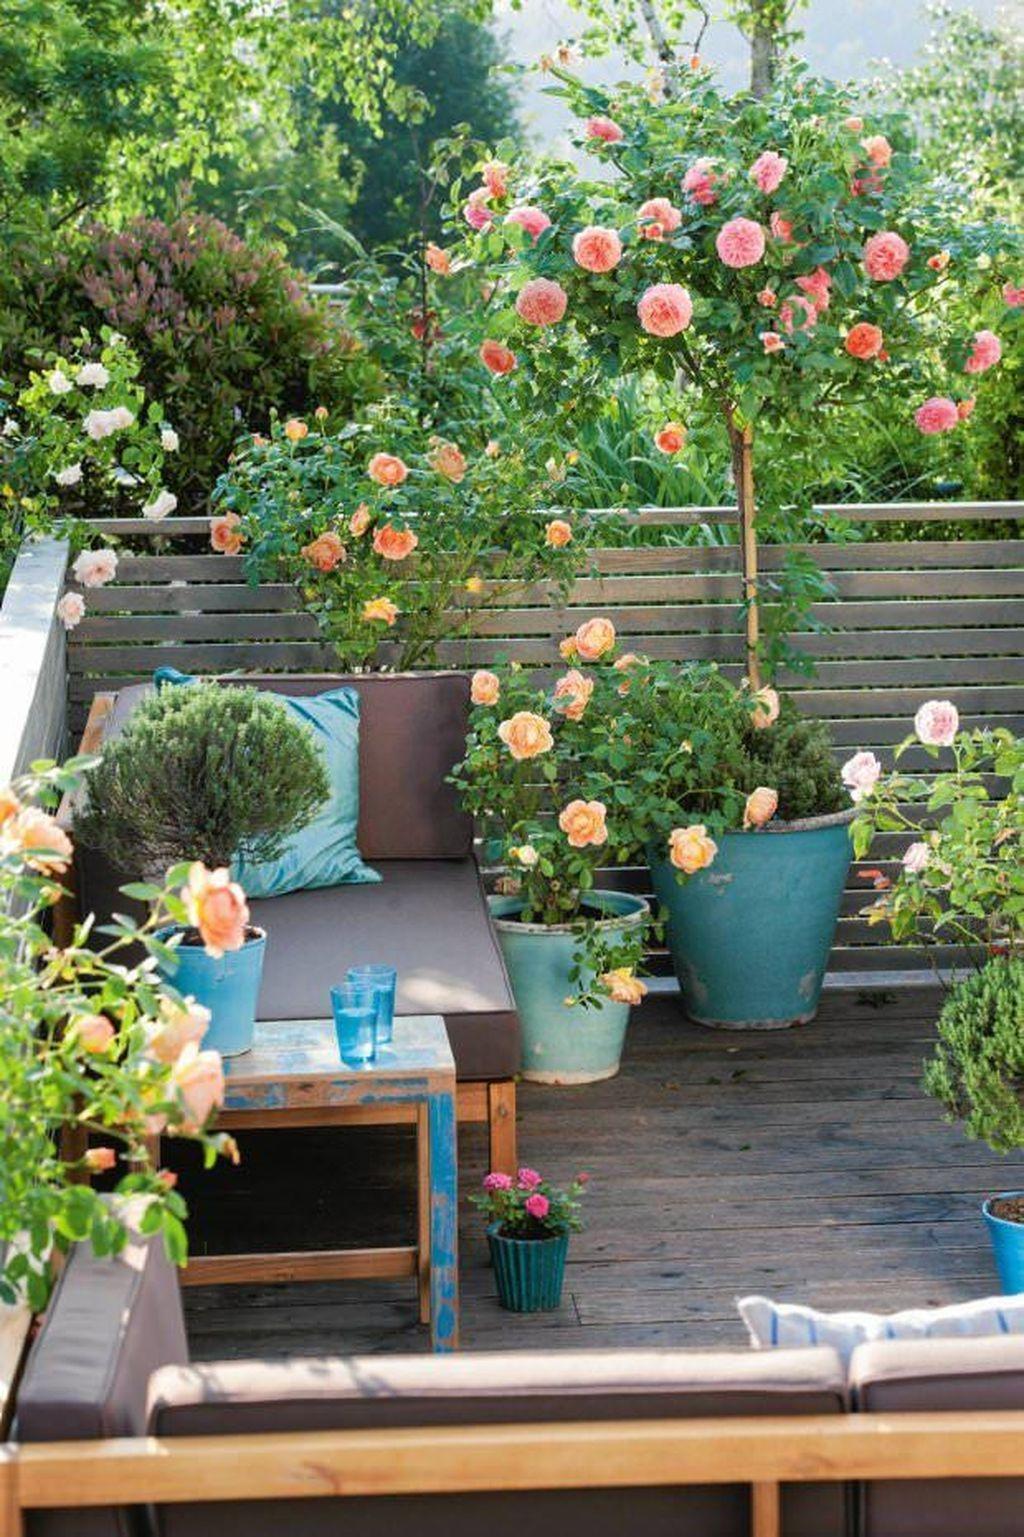 33 Beauty Small Balcony Garden Ideas Exquisite Gardens Small Balcony Garden Small Garden Design